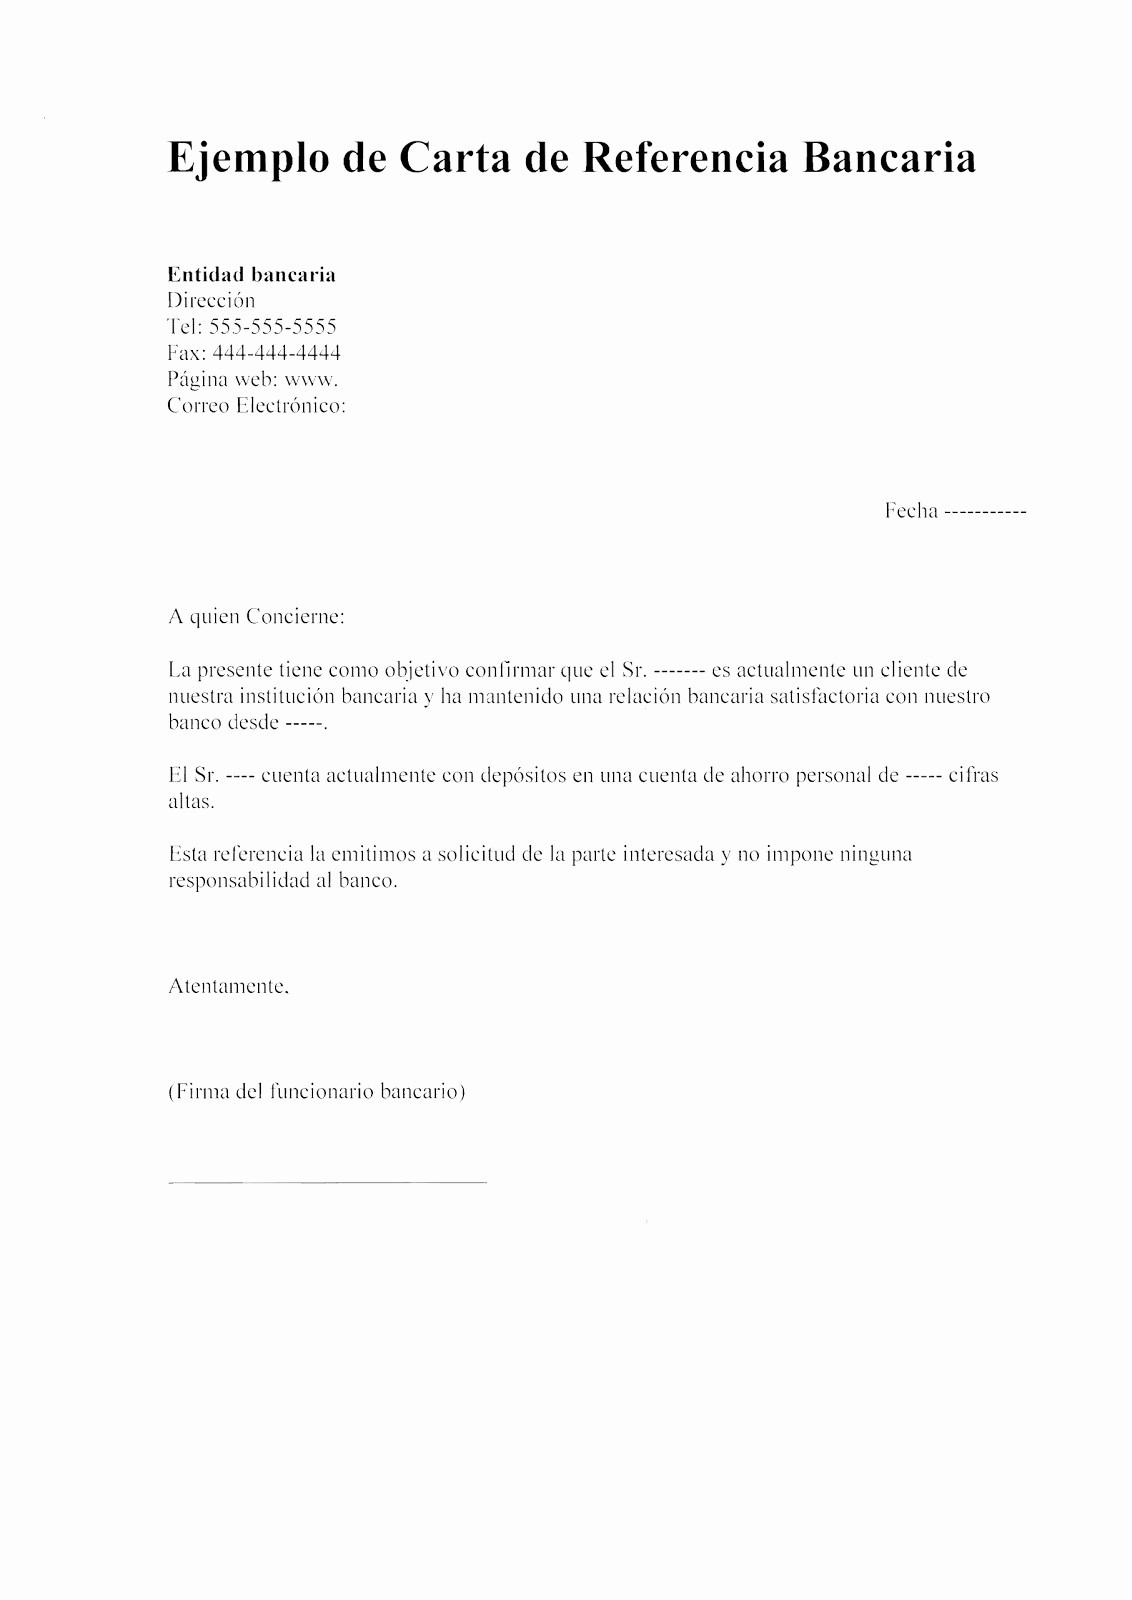 Modelo Carta De Recomendacion Personal Unique Frases Con Referencia Personal Ejemplo